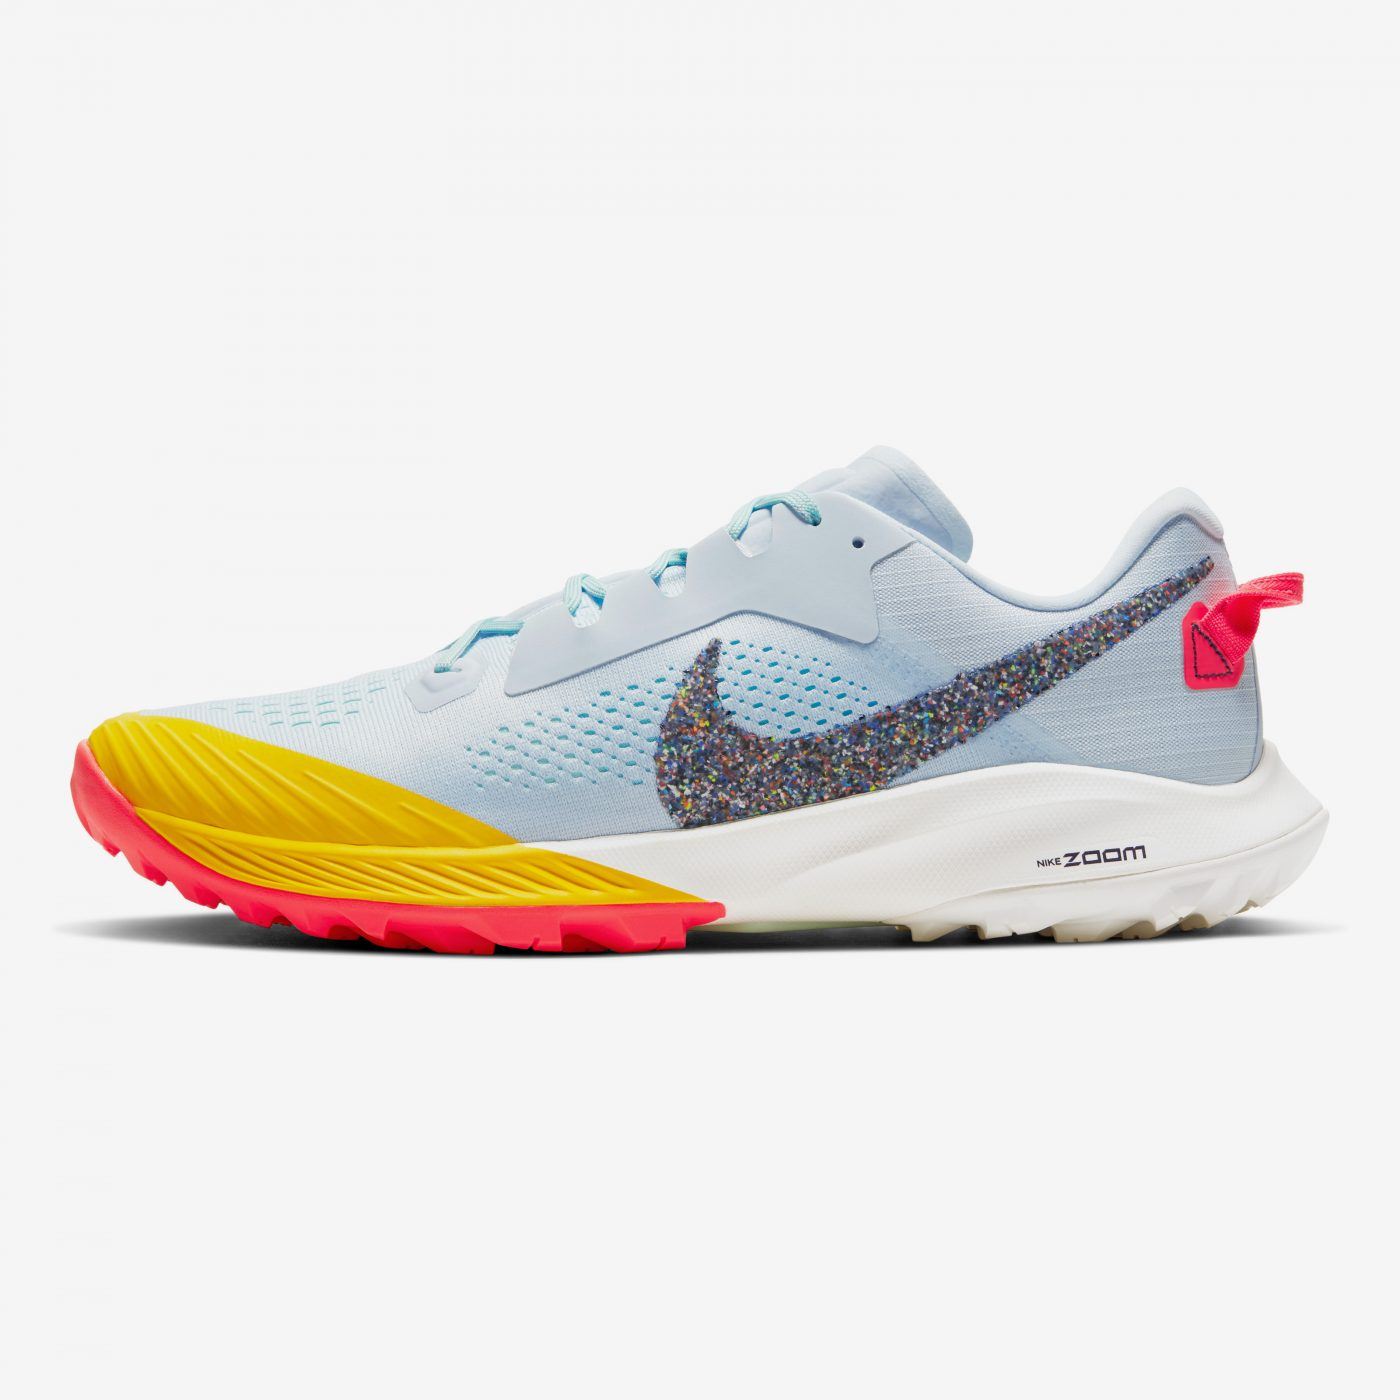 nike-chaussures-trail-Air-Zoom-Terra-Kiger-6-6-runpack-2